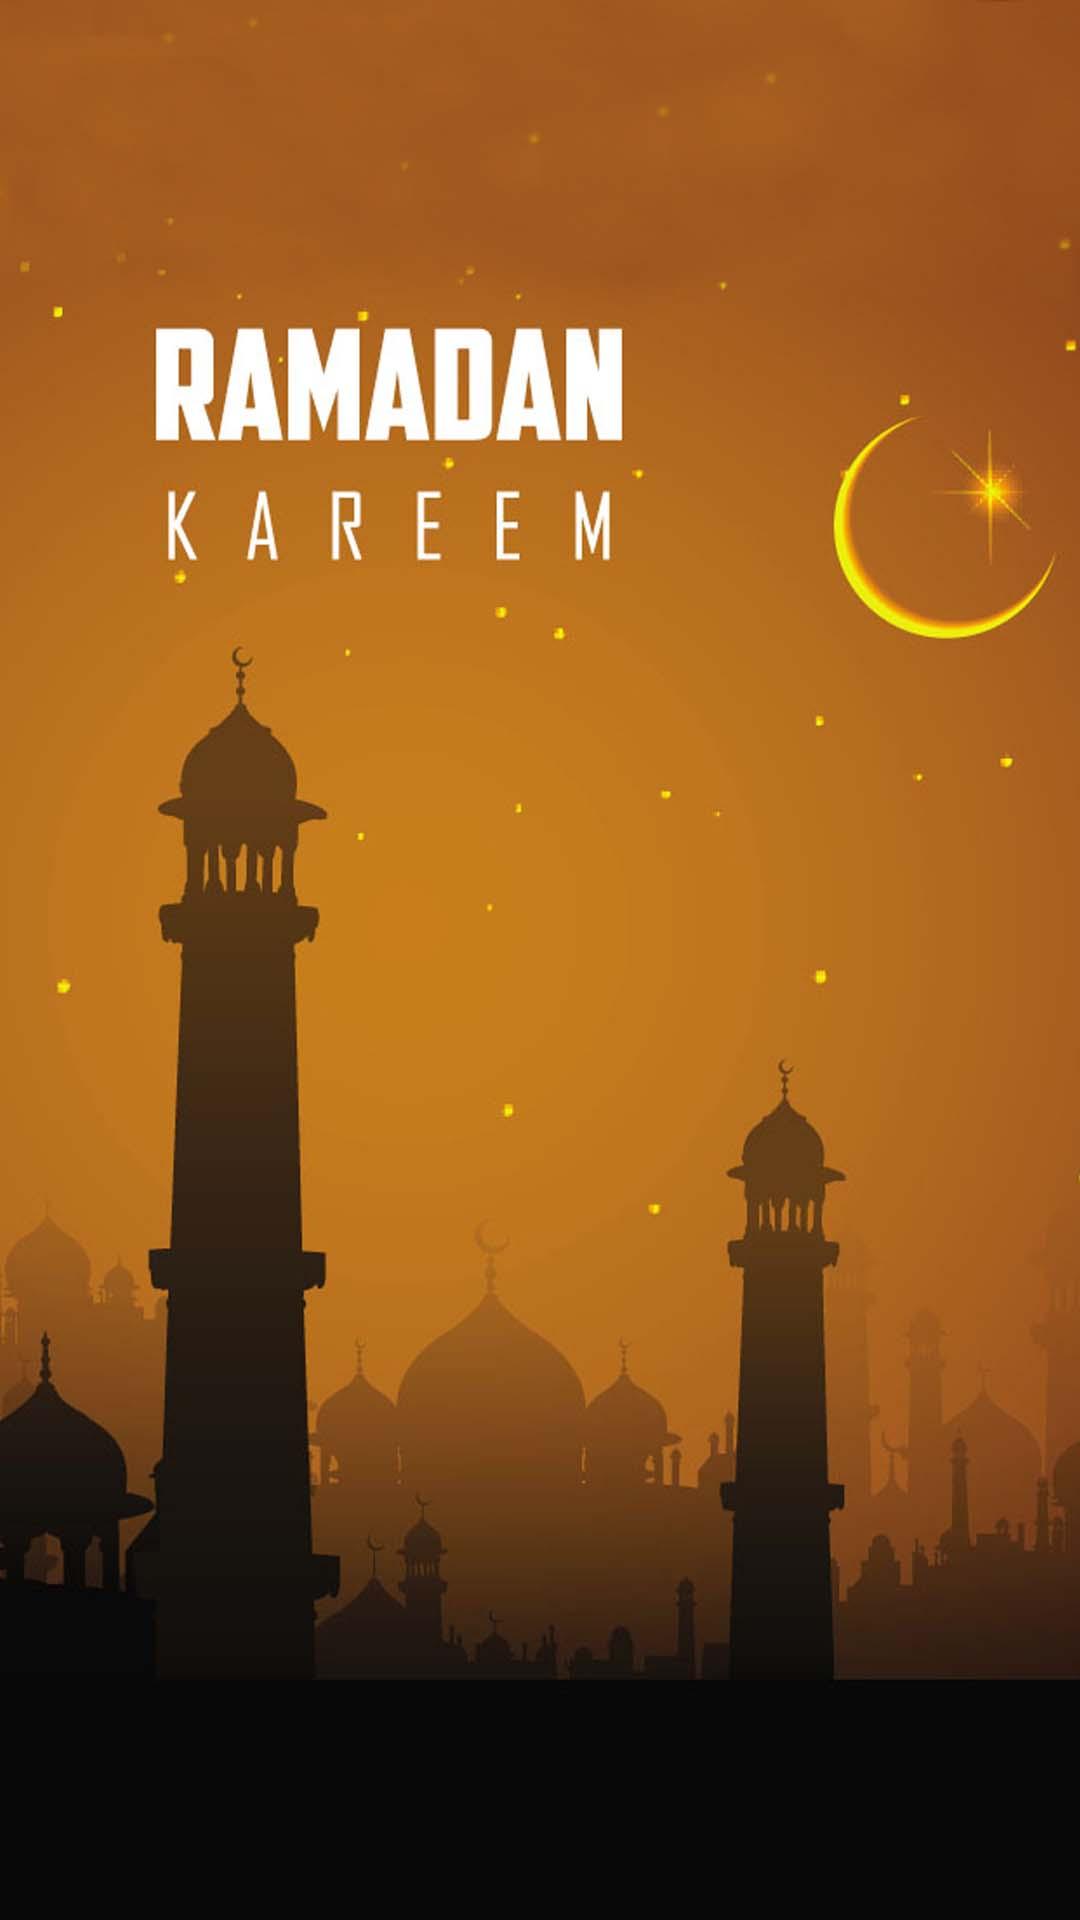 خلفيات موبايل رمضان كريم Mobile Wallpapers HD 7 خلفيات موبايل رمضان كريم Mobile Wallpapers HD